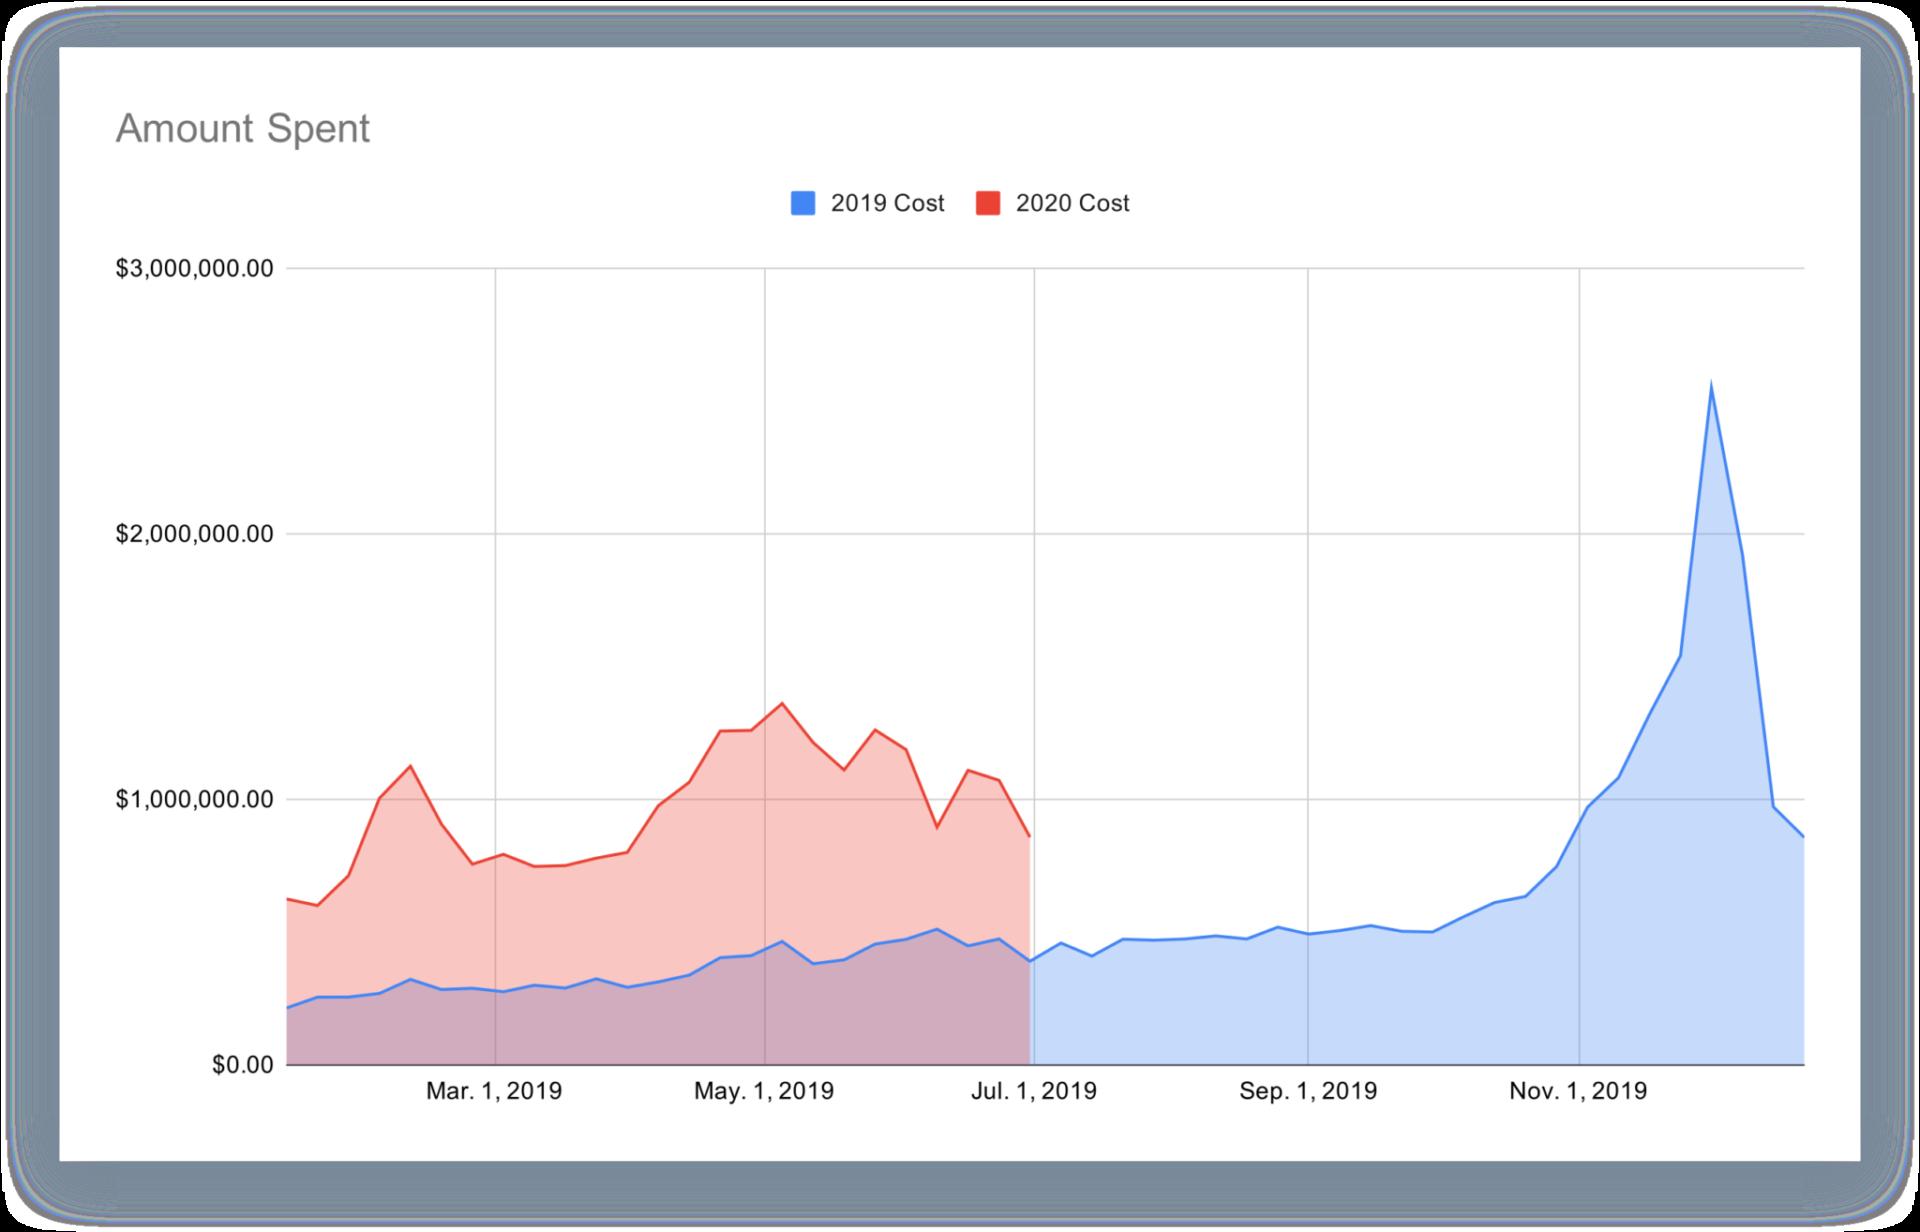 Amount spent data